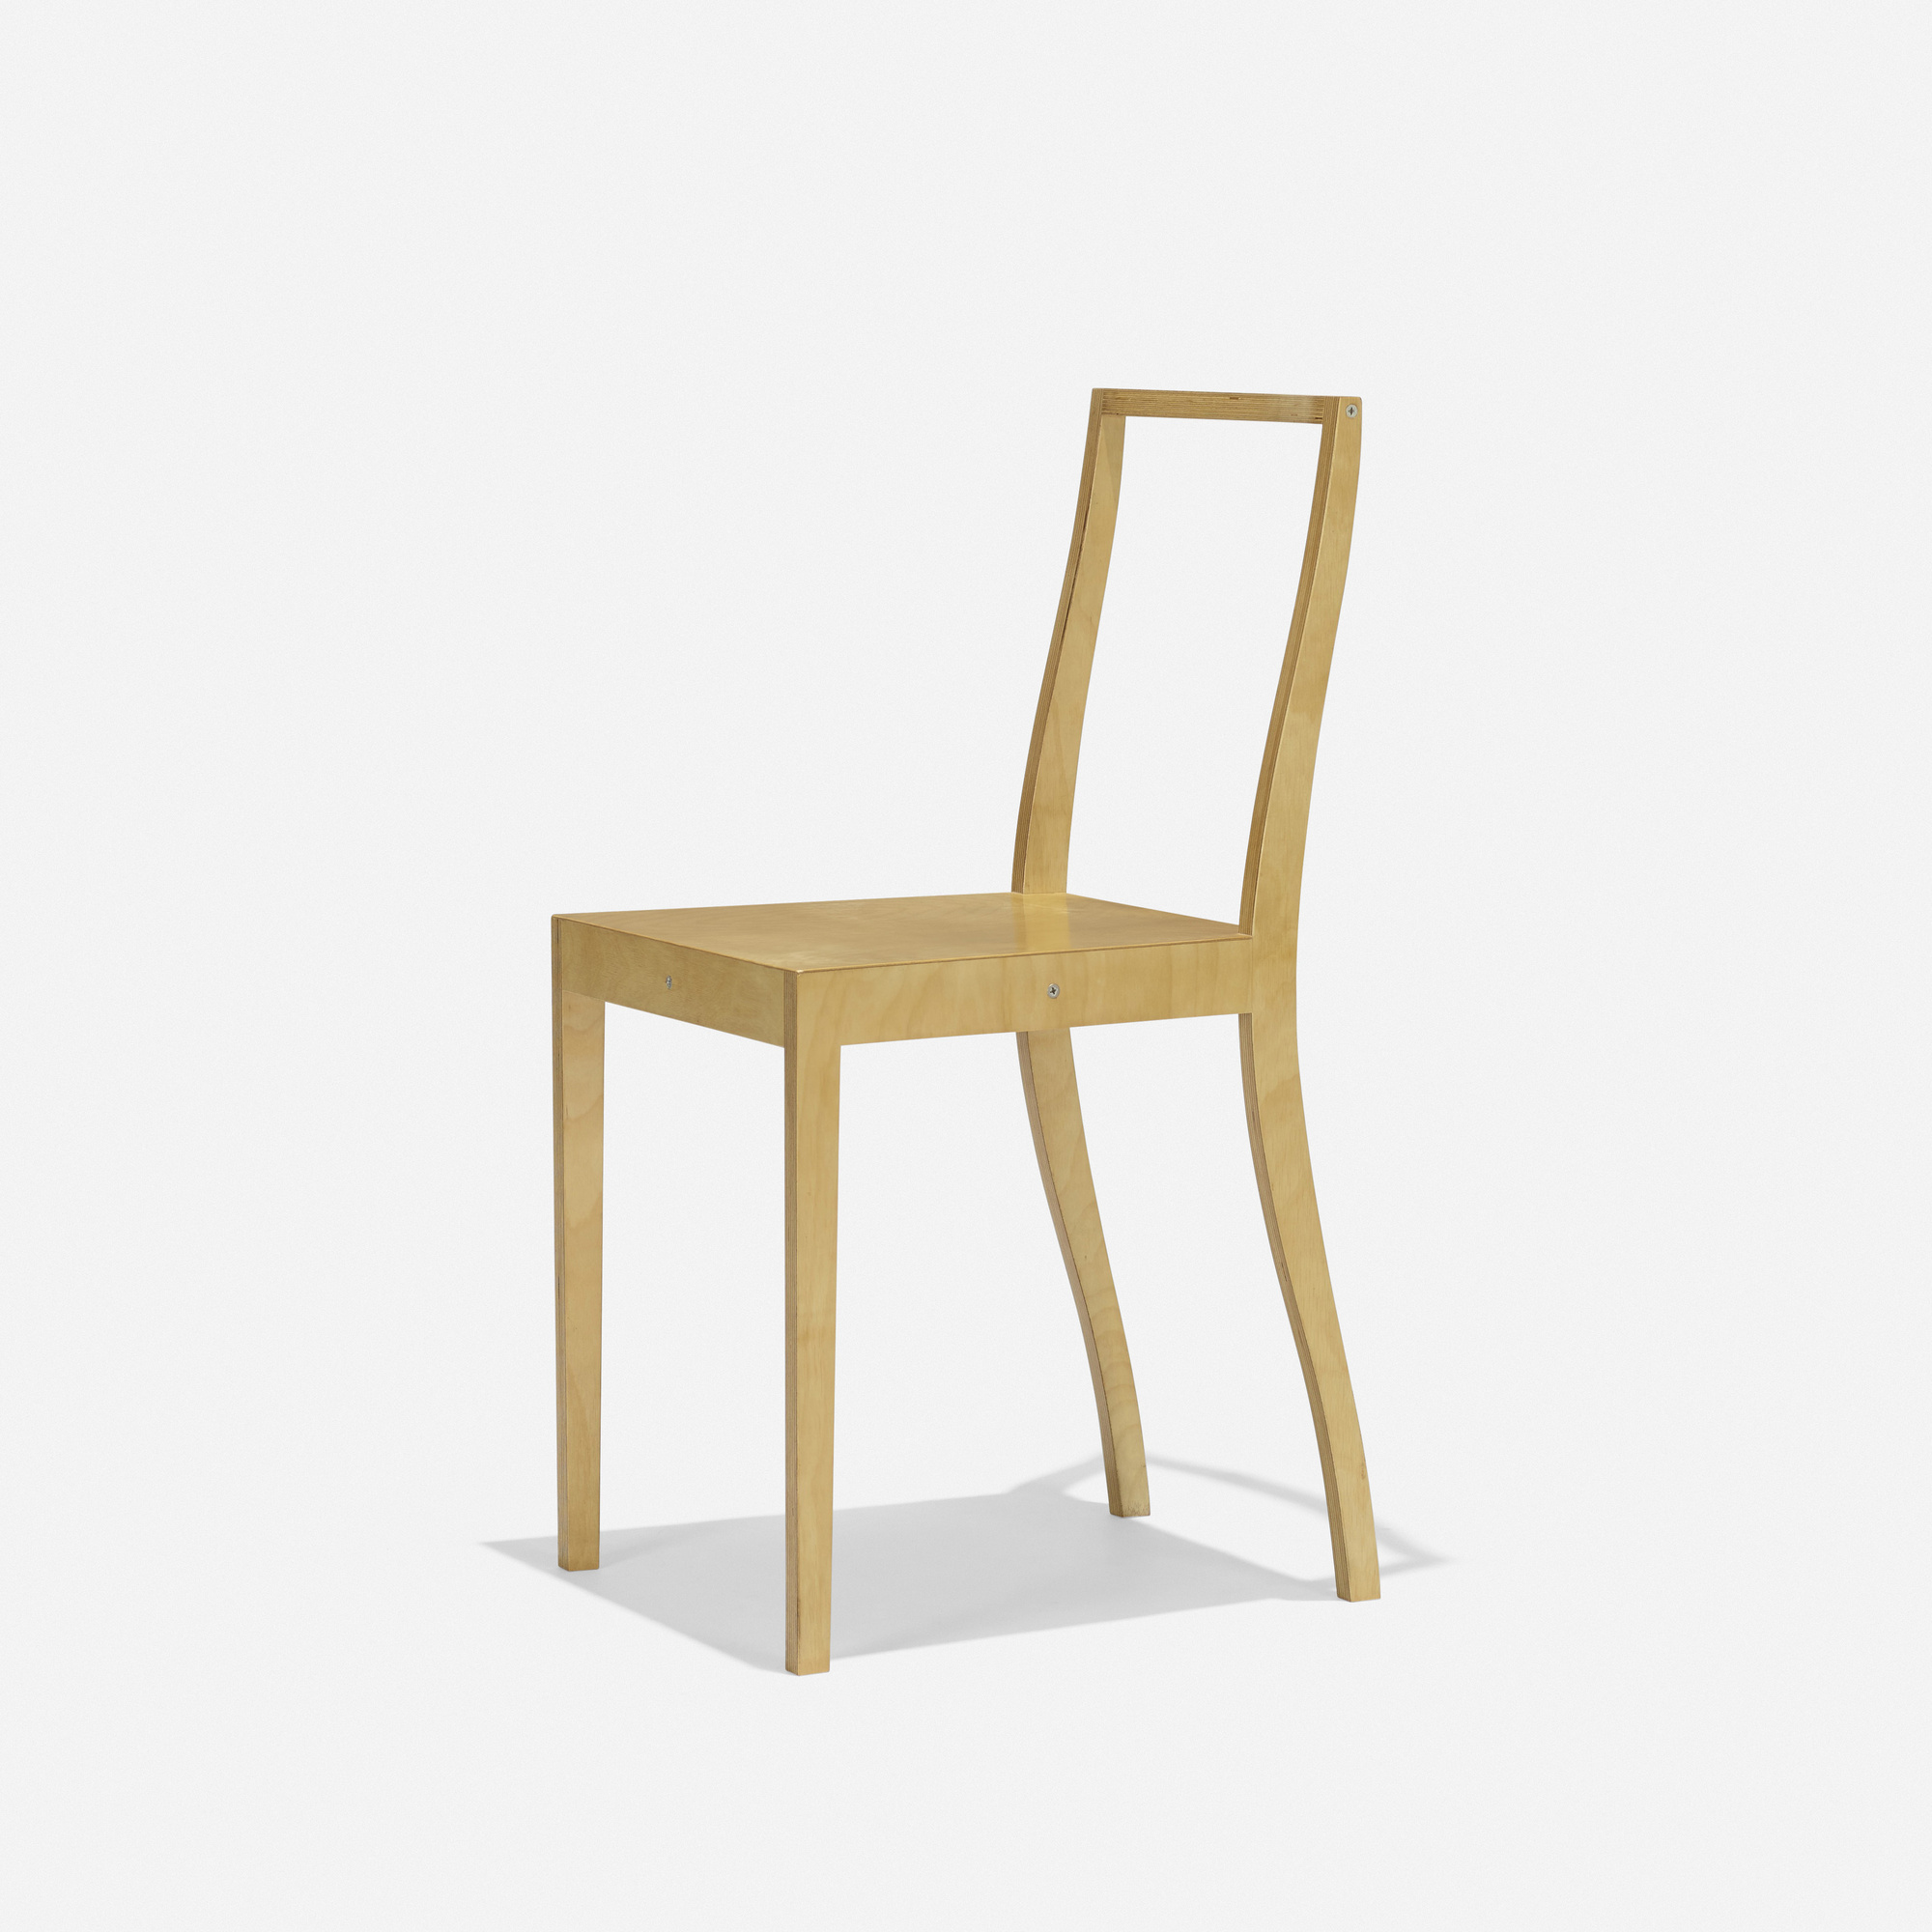 342 jasper morrison ply chair for Plywood chair morrison